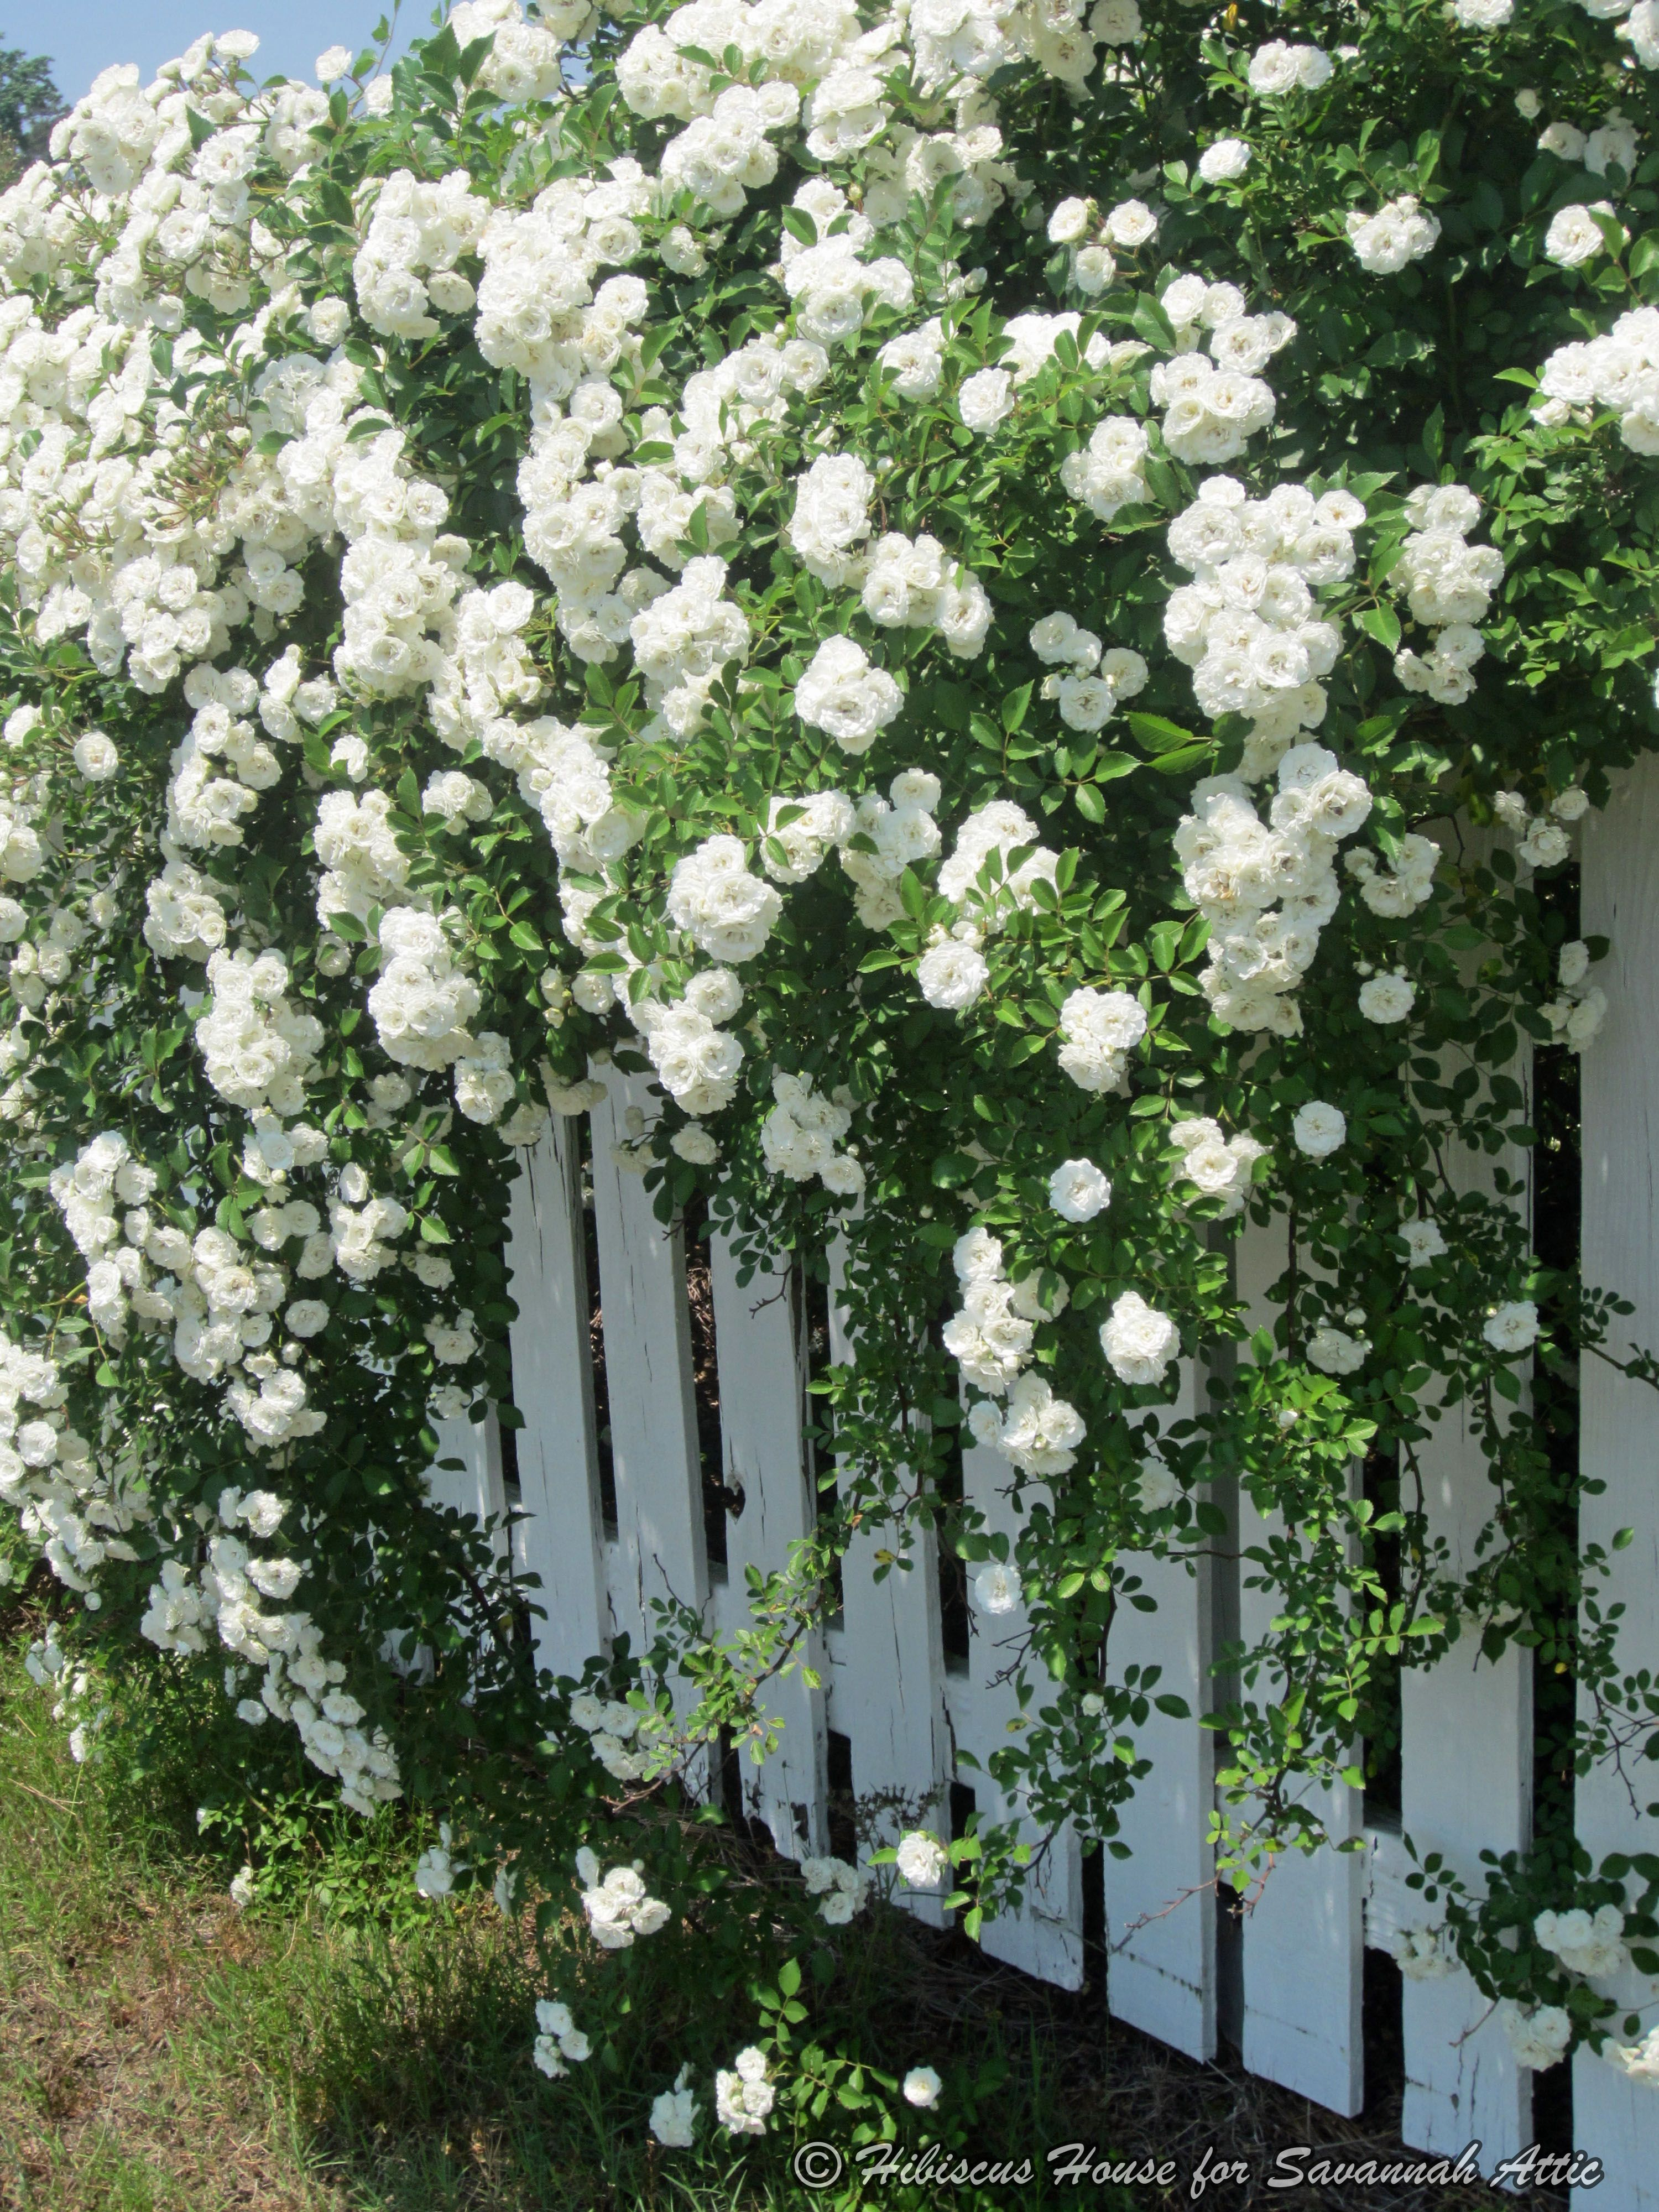 Hibiscus House Climbing Iceberg Roses White climbing